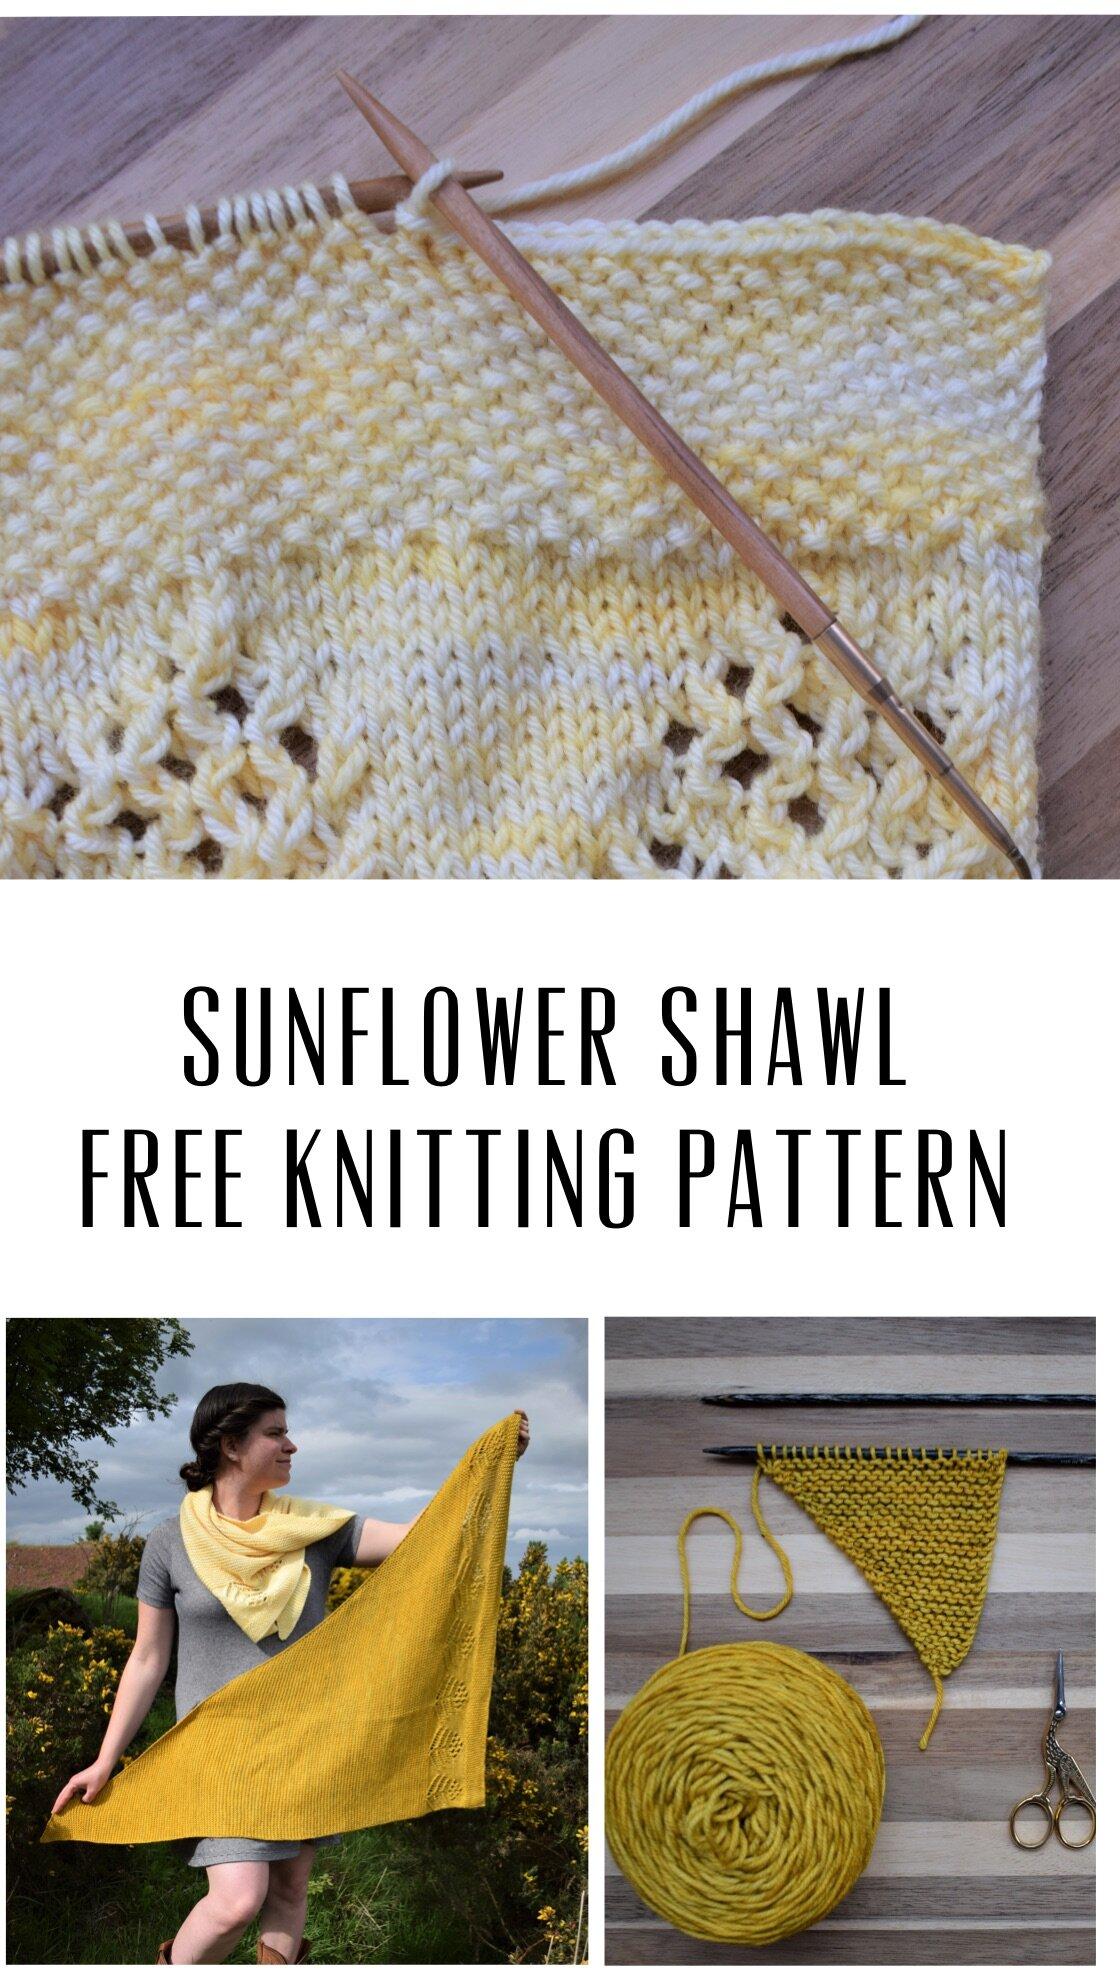 Sunflower_Knit_Shawl_Free_Pattern_2.jpg